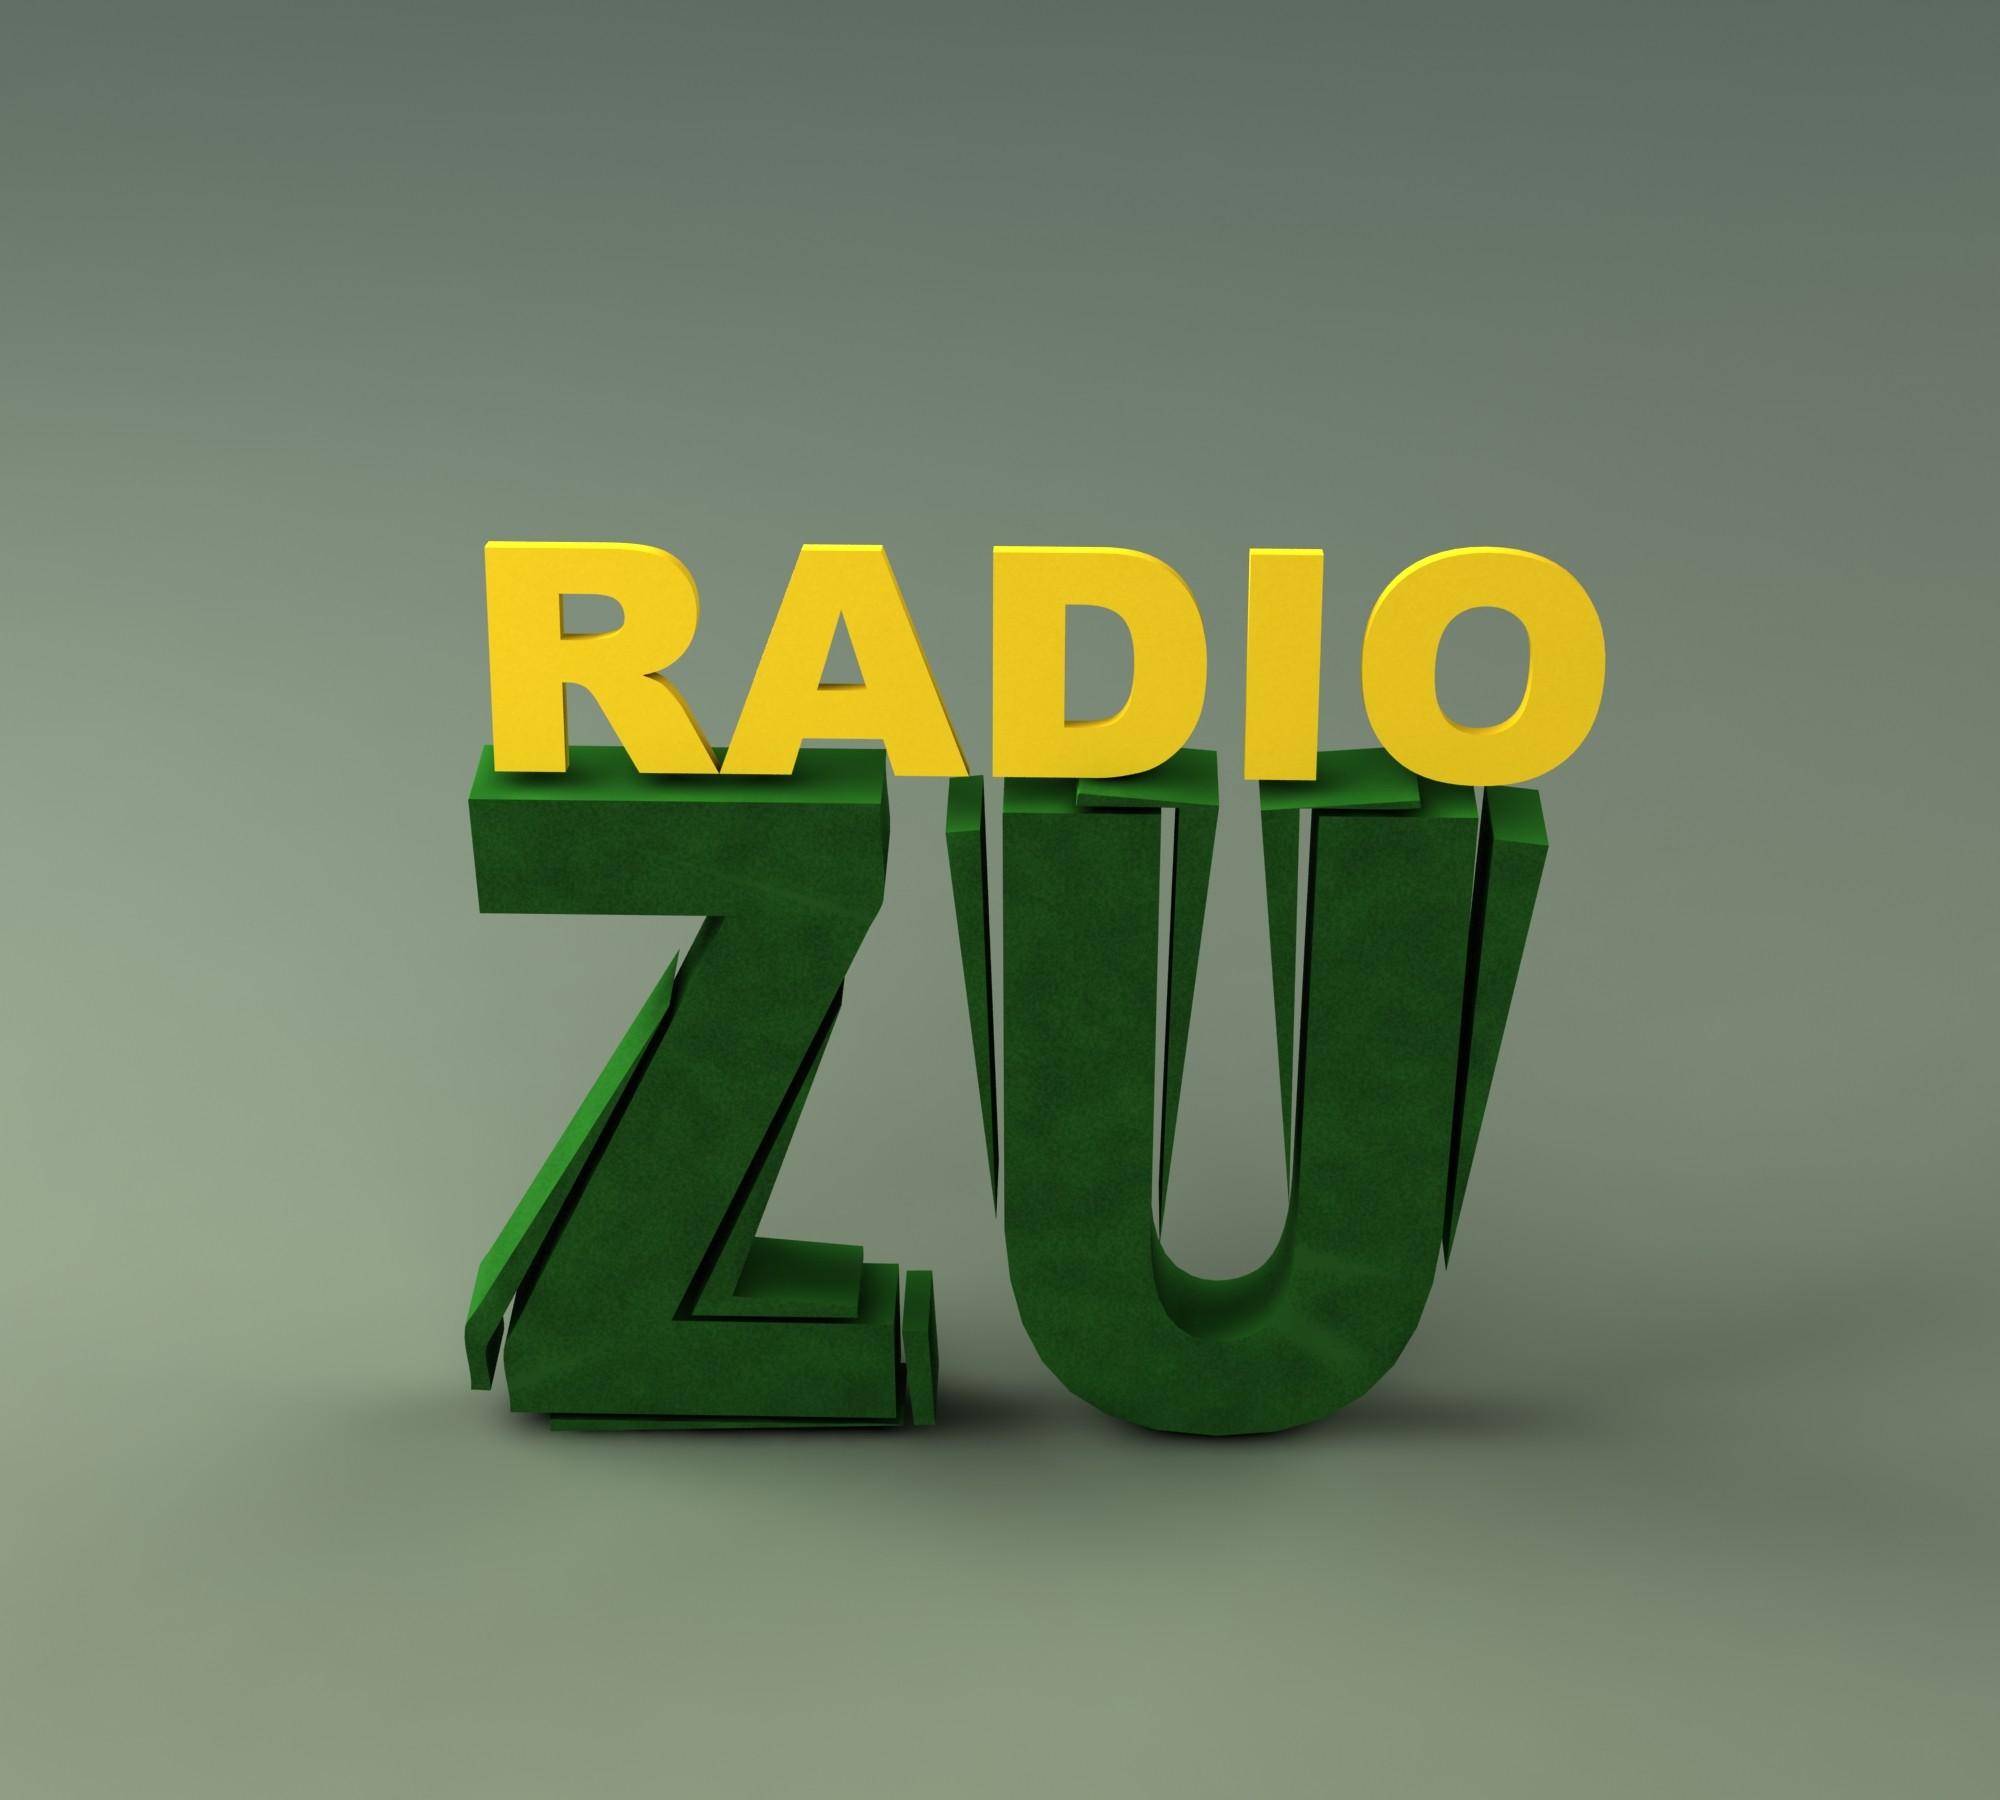 Radiozu1.jpg